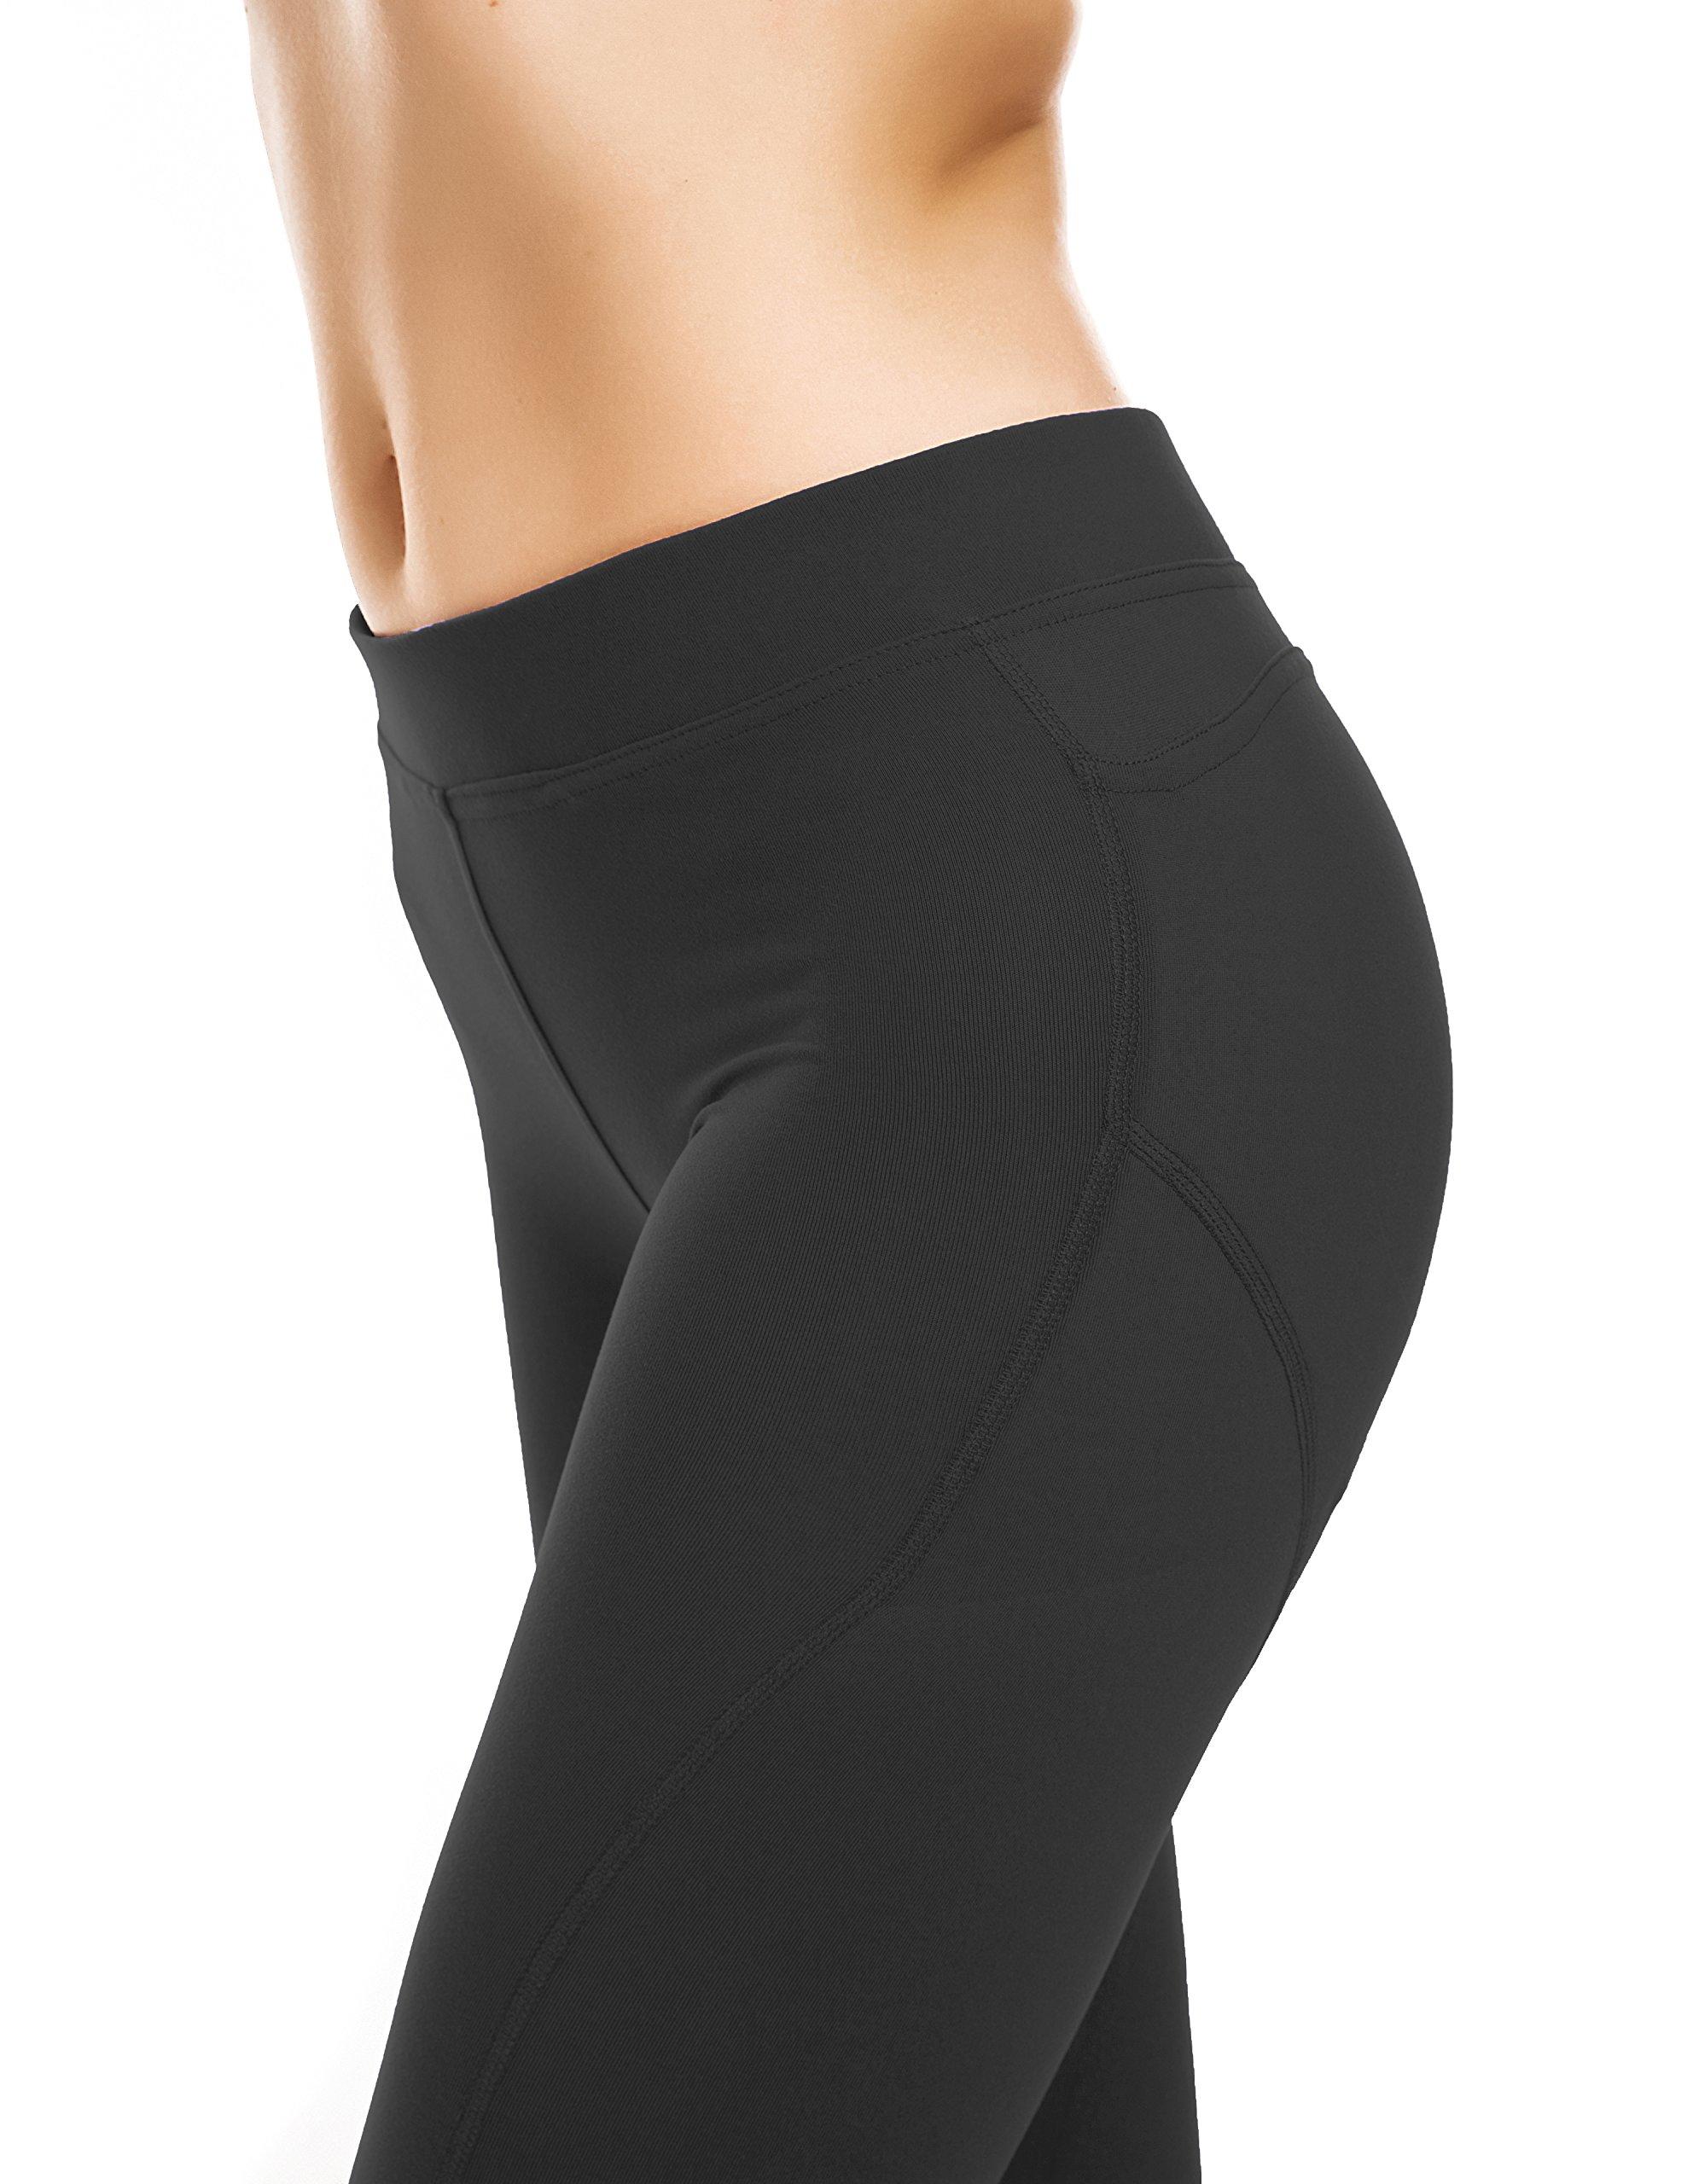 Fabulous RUNNING GIRL Sexy Butt Lift Push Up Leggings Yoga Pants Shapewear  HG53